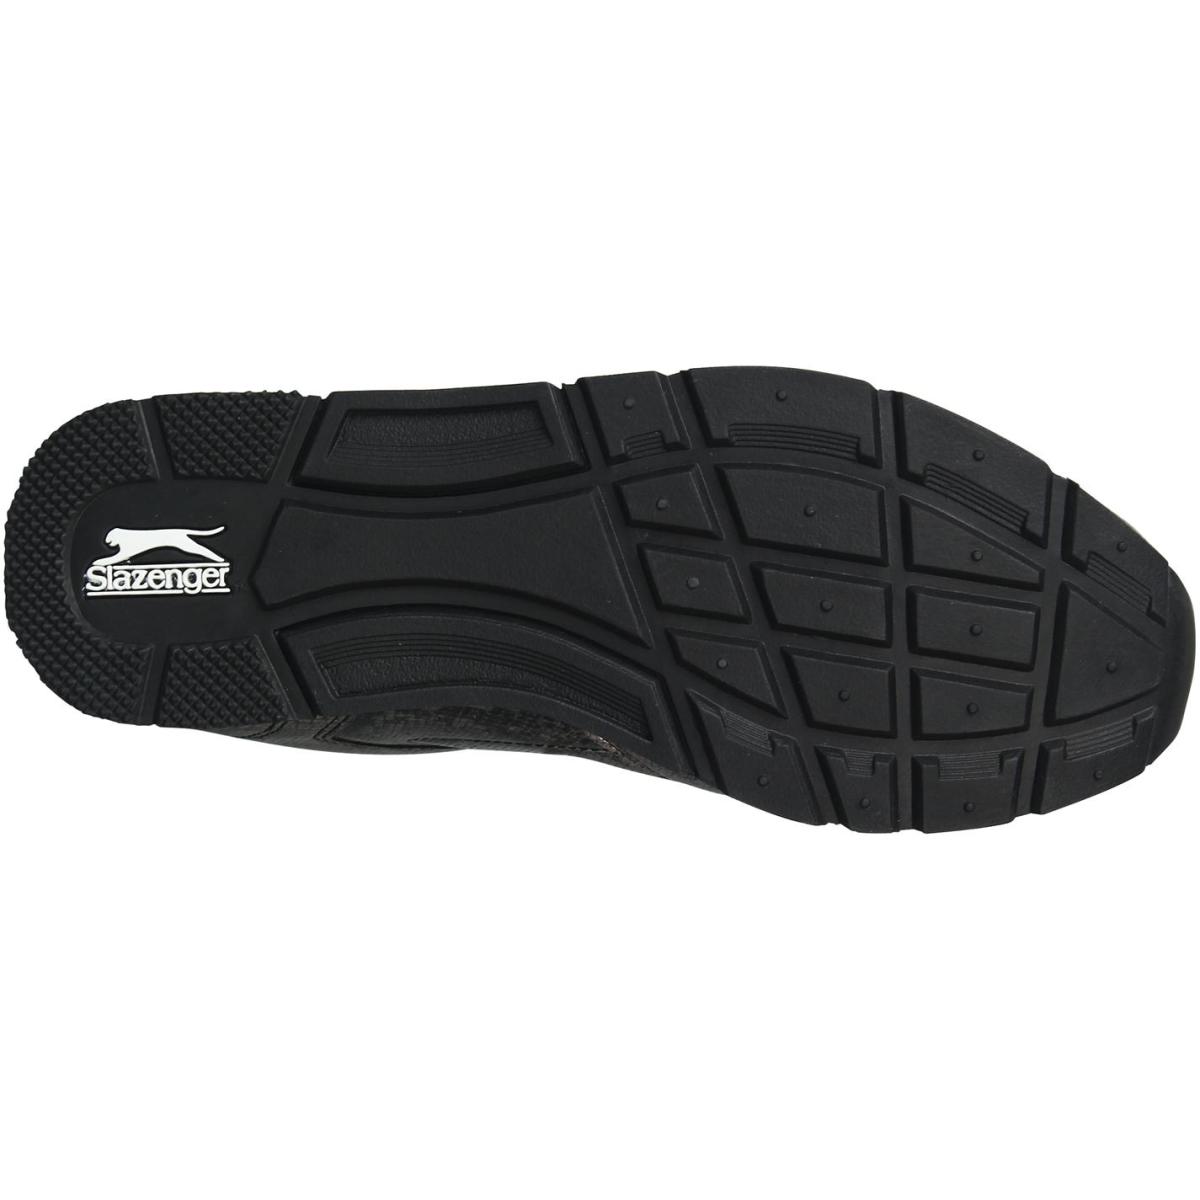 Slazenger-Classic-Turnschuhe-Laufschuhe-Damen-Sportschuhe-Sneaker-1265 Indexbild 3